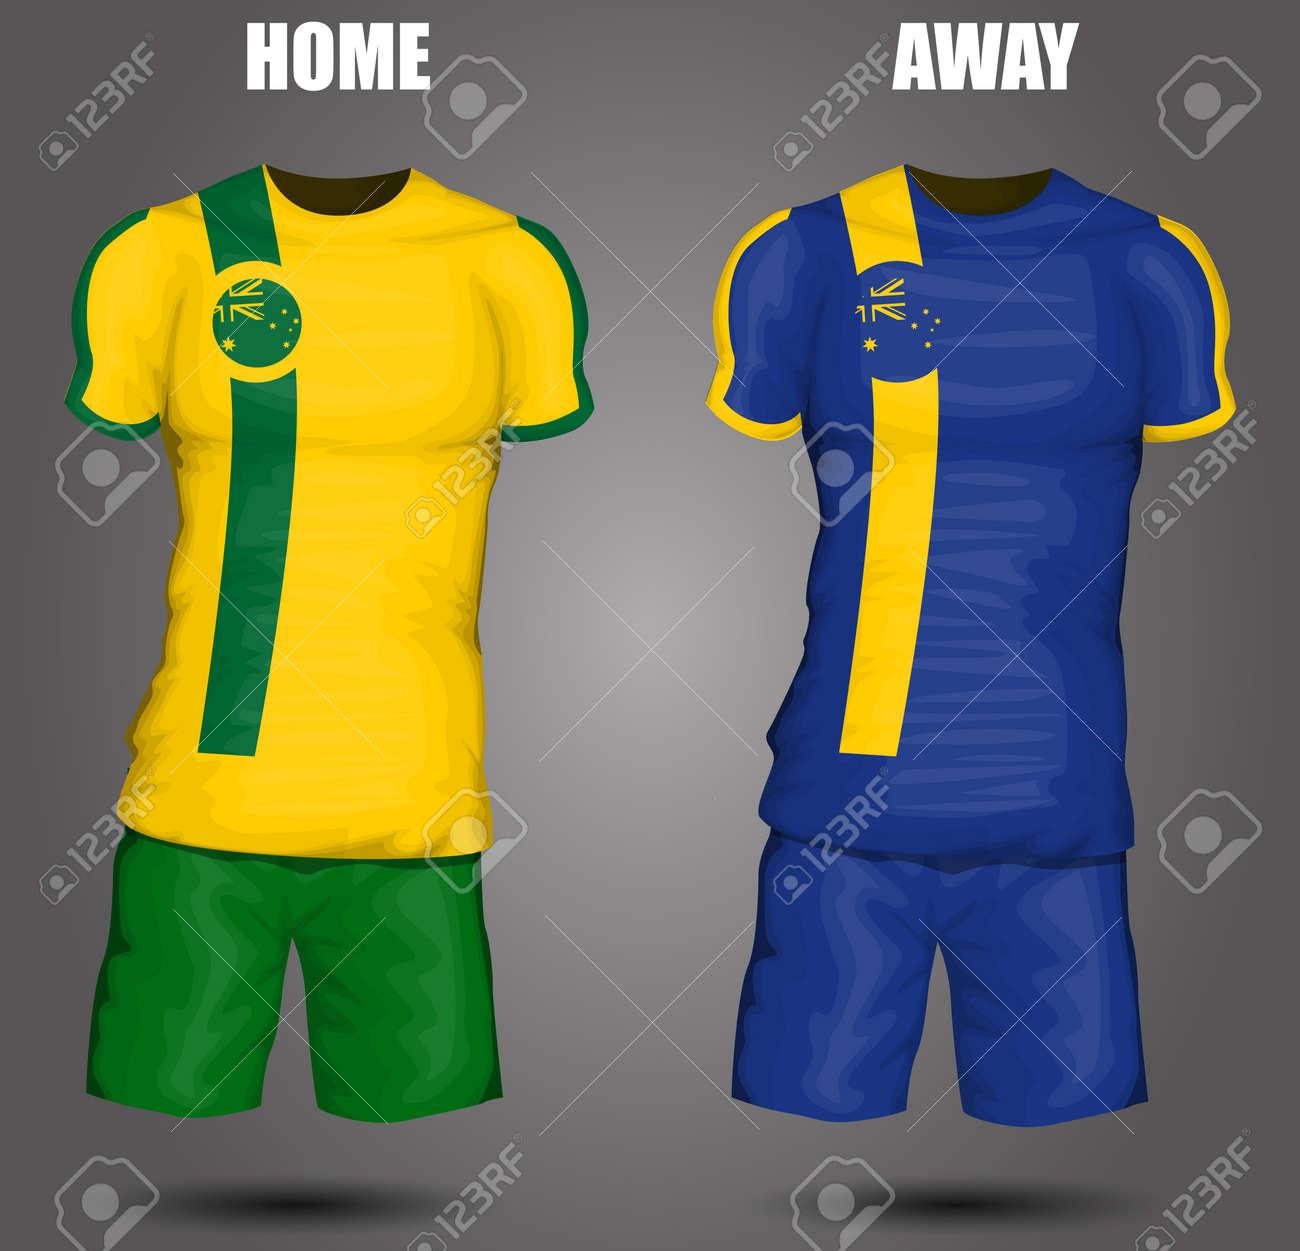 ab6847f45 Australia soccer jersey Stock Vector - 28036521